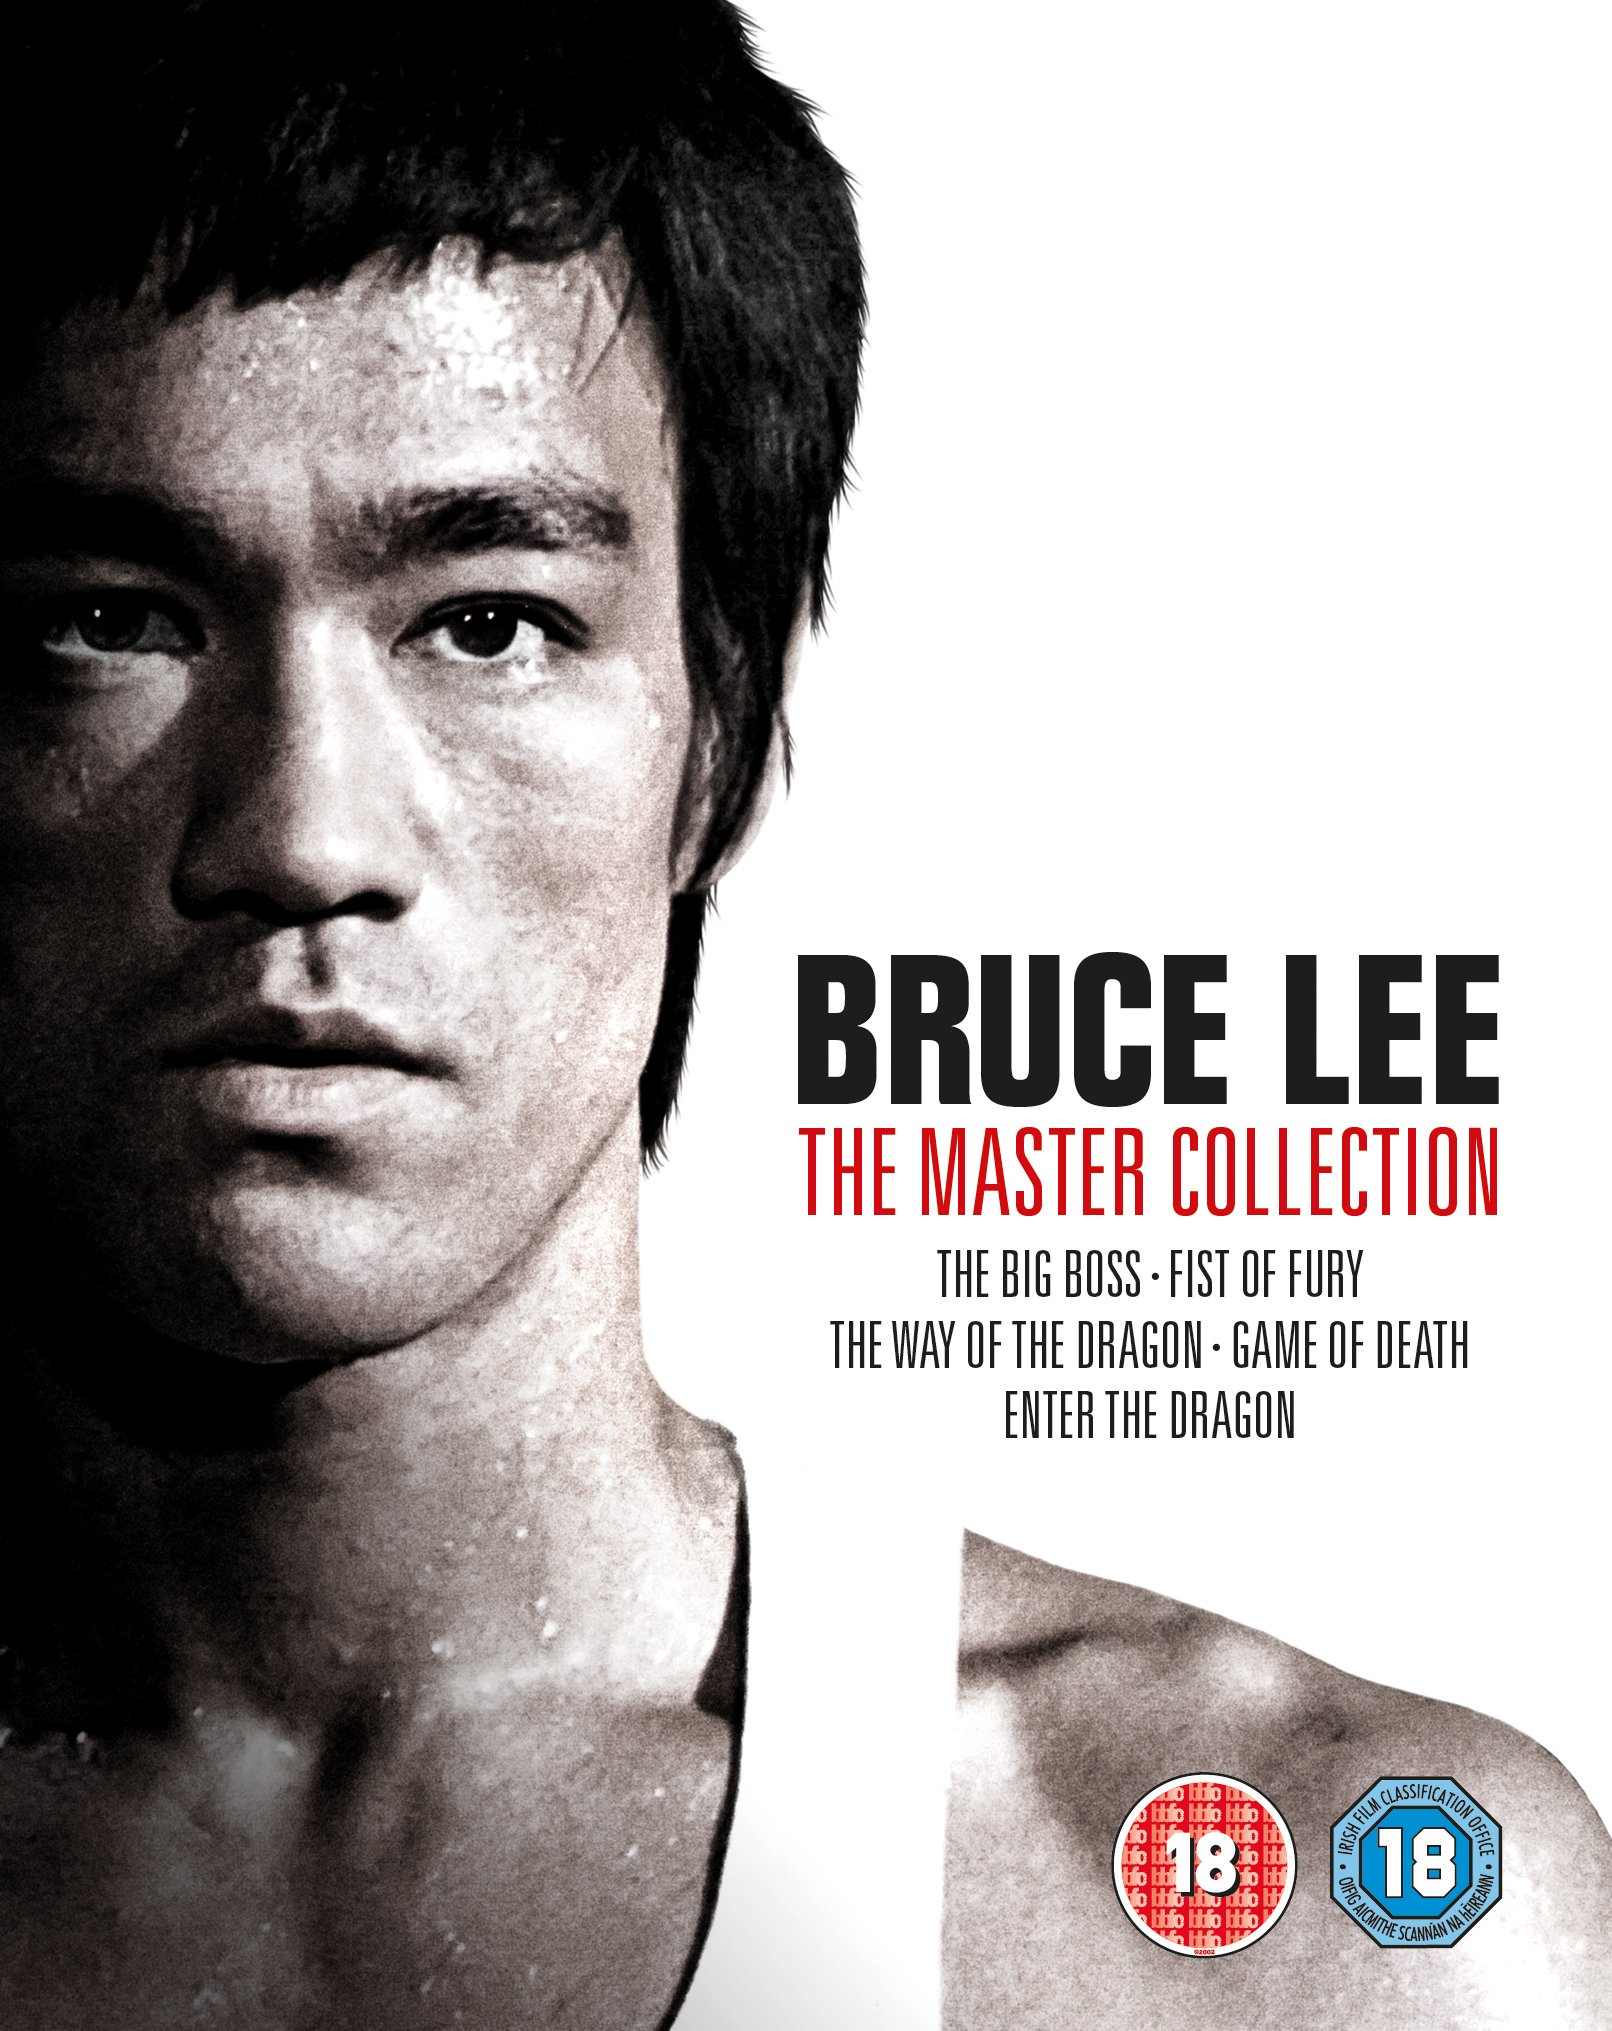 Bruce Lee The Master Collection - BD + bonus DVD [Blu-ray]